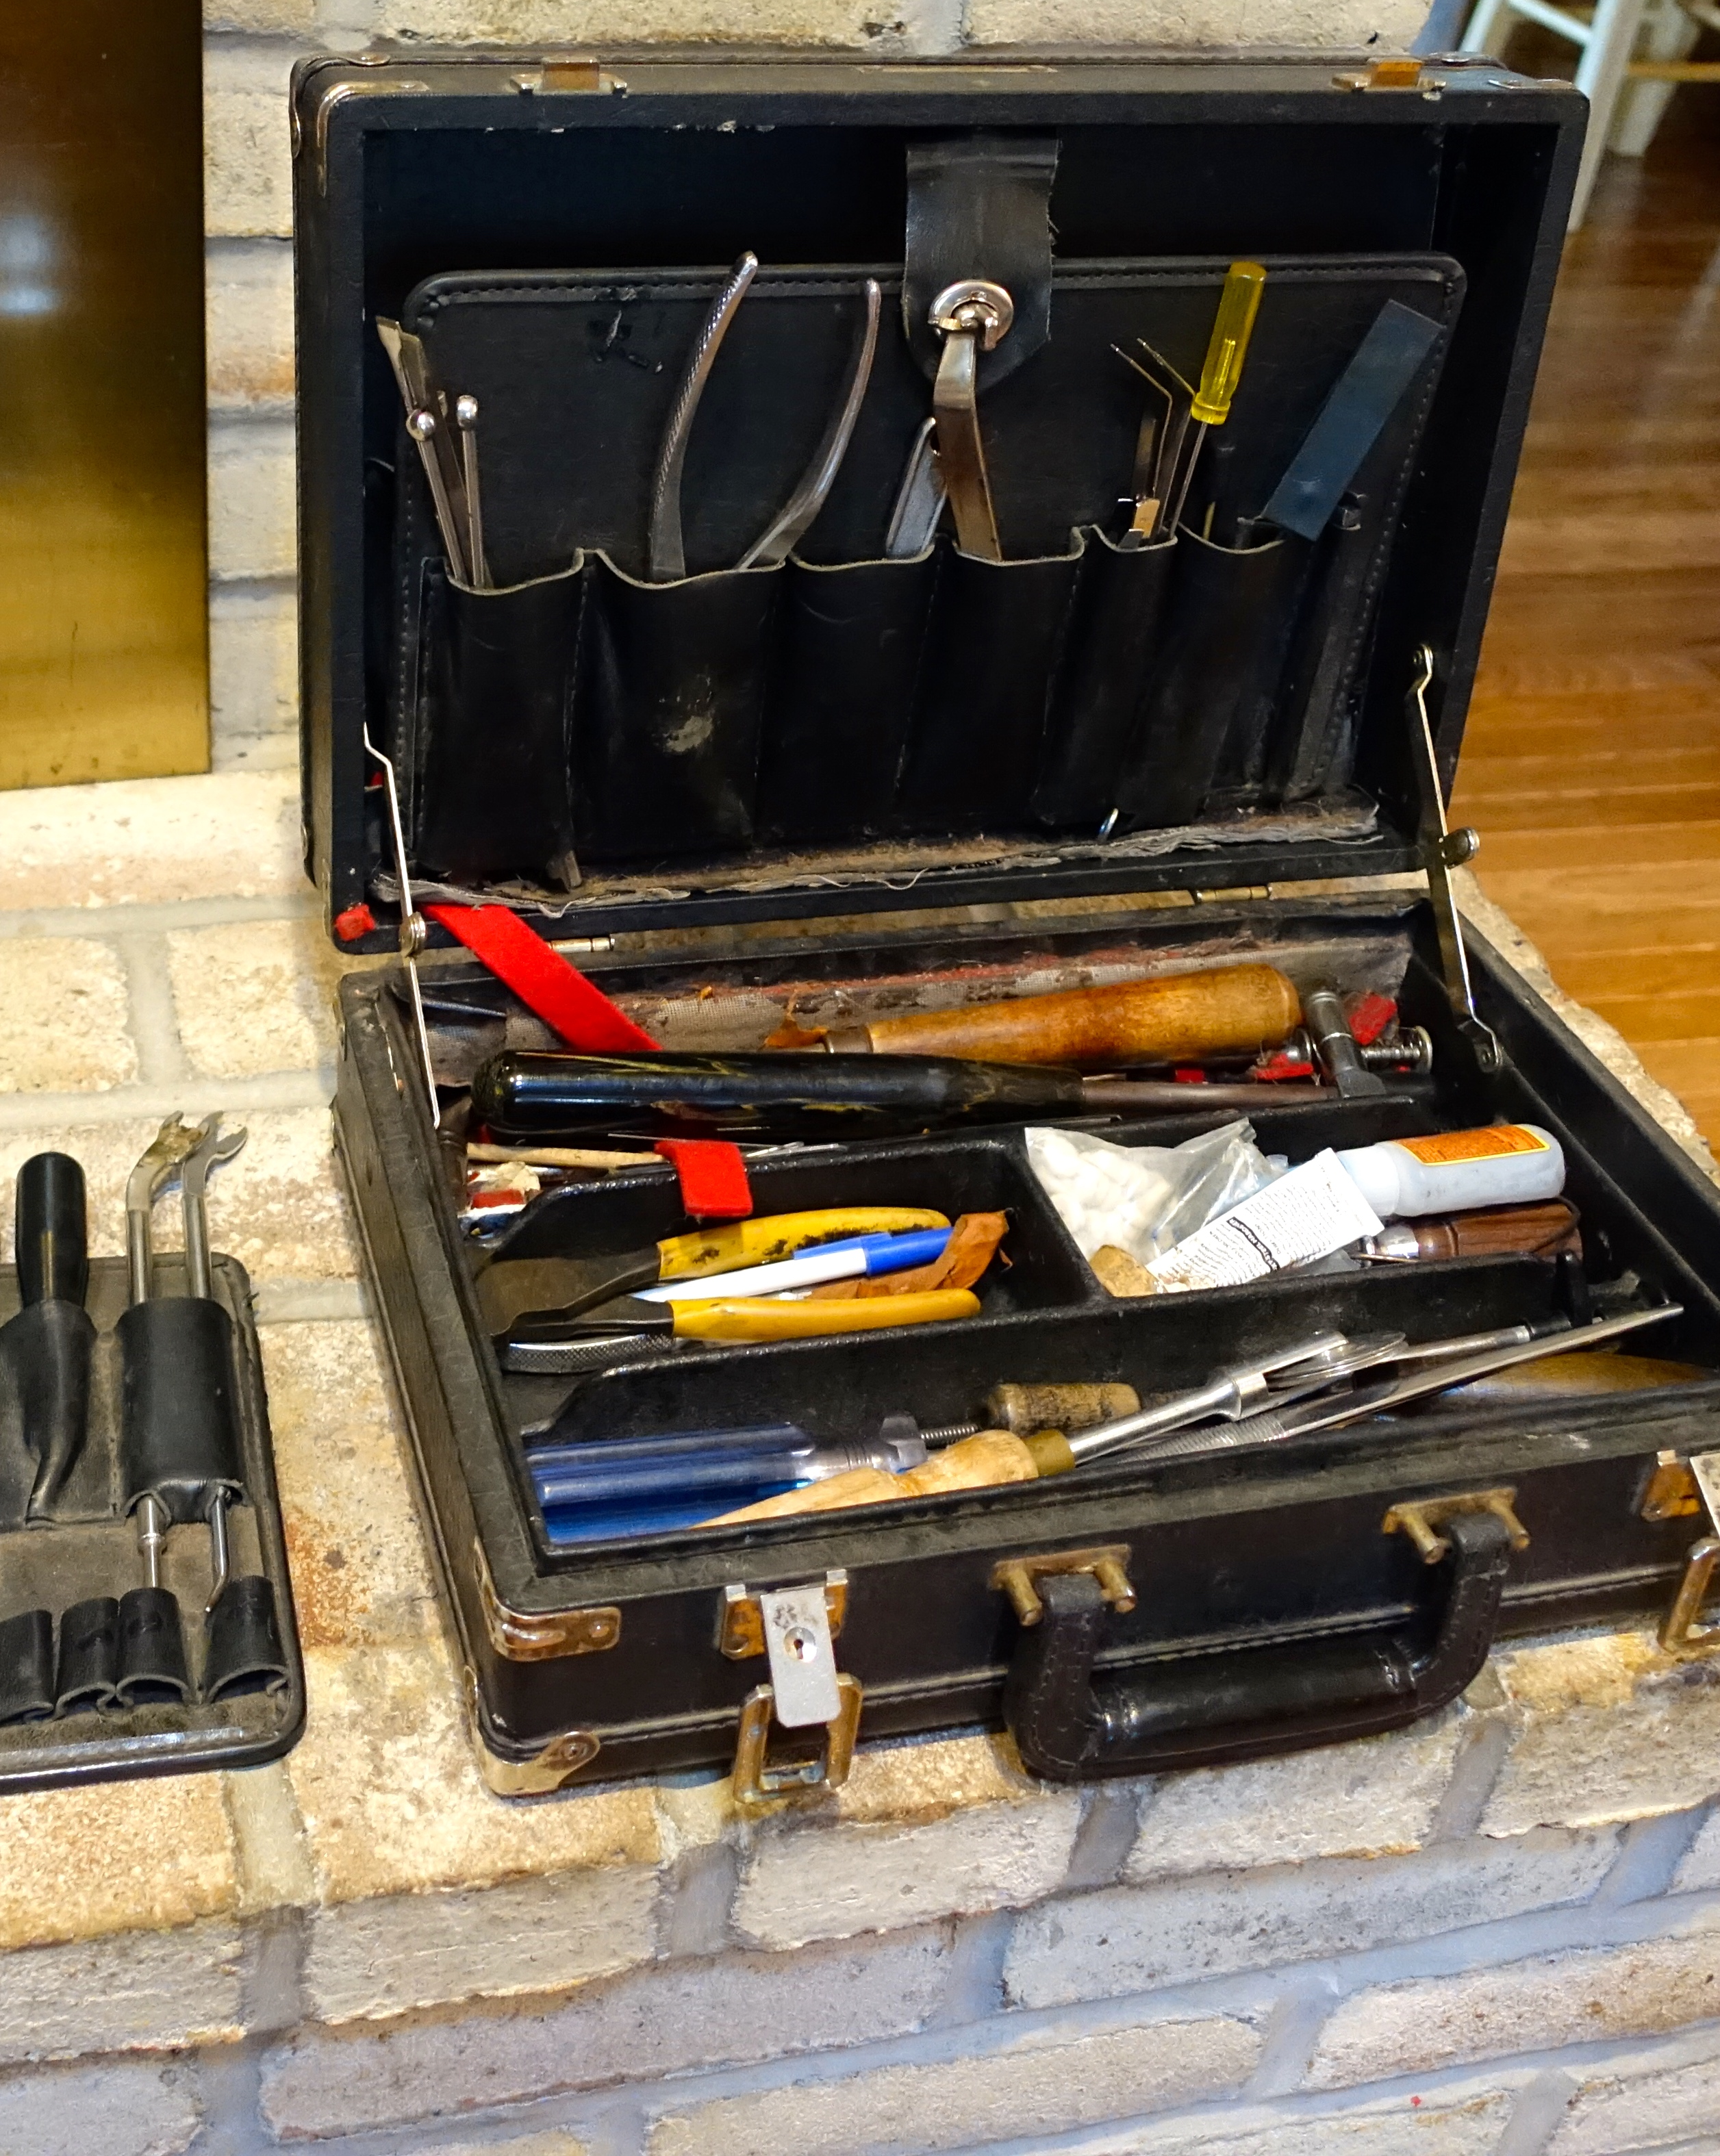 Piano tuner tools